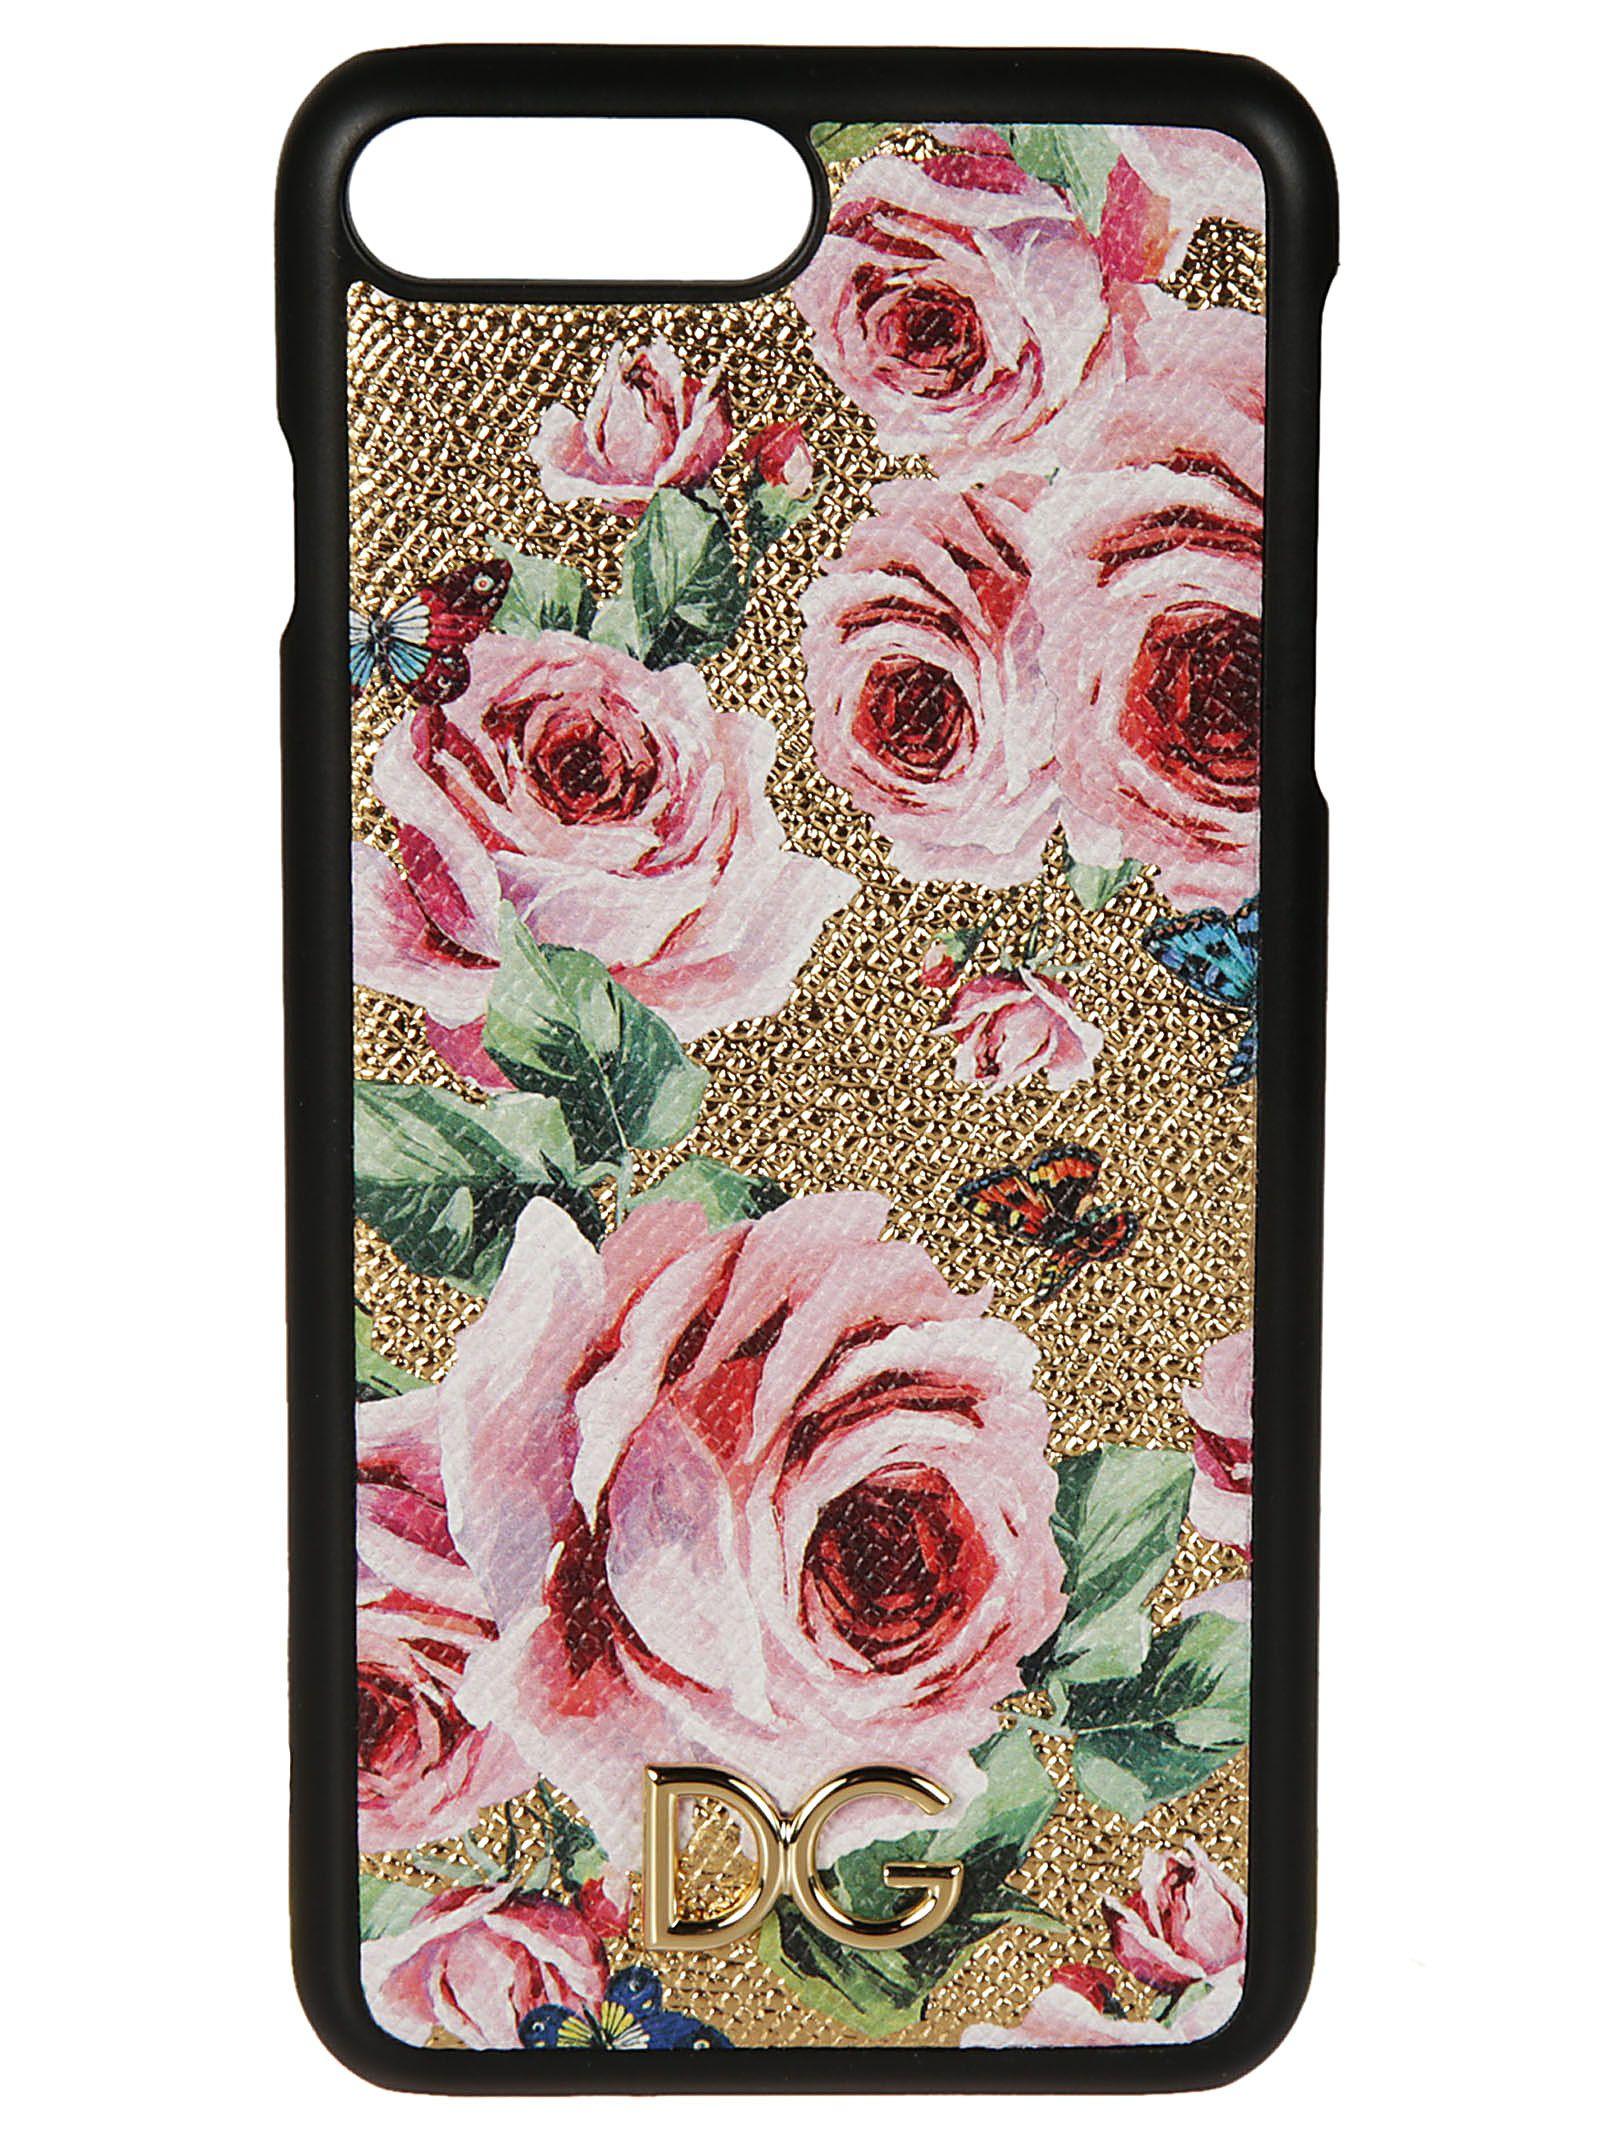 Dolce & Gabbana Rose Print Iphone 6 Case